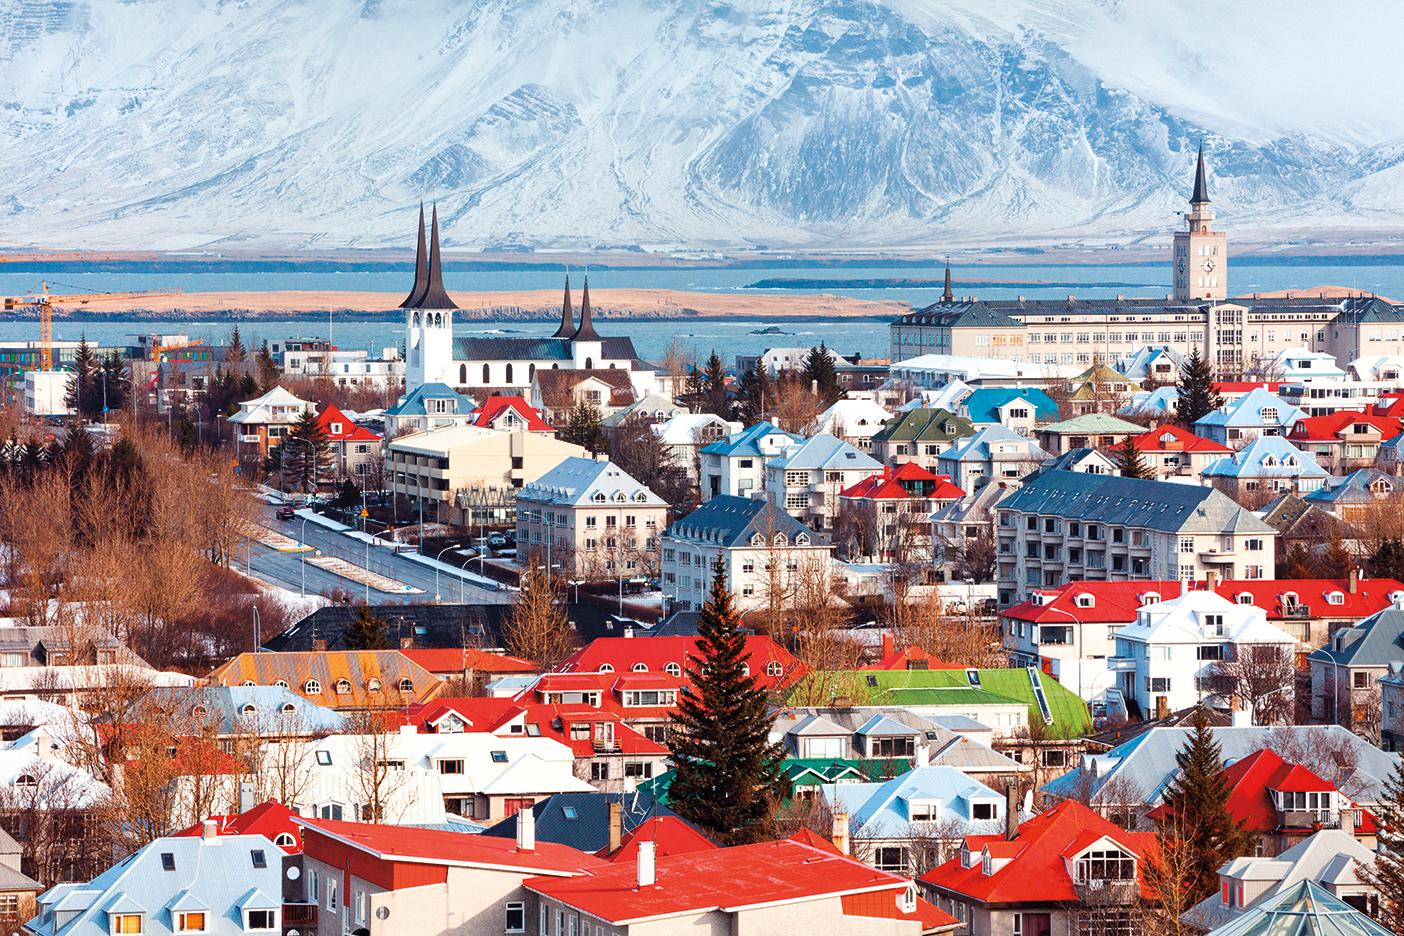 Image de Reykjavík